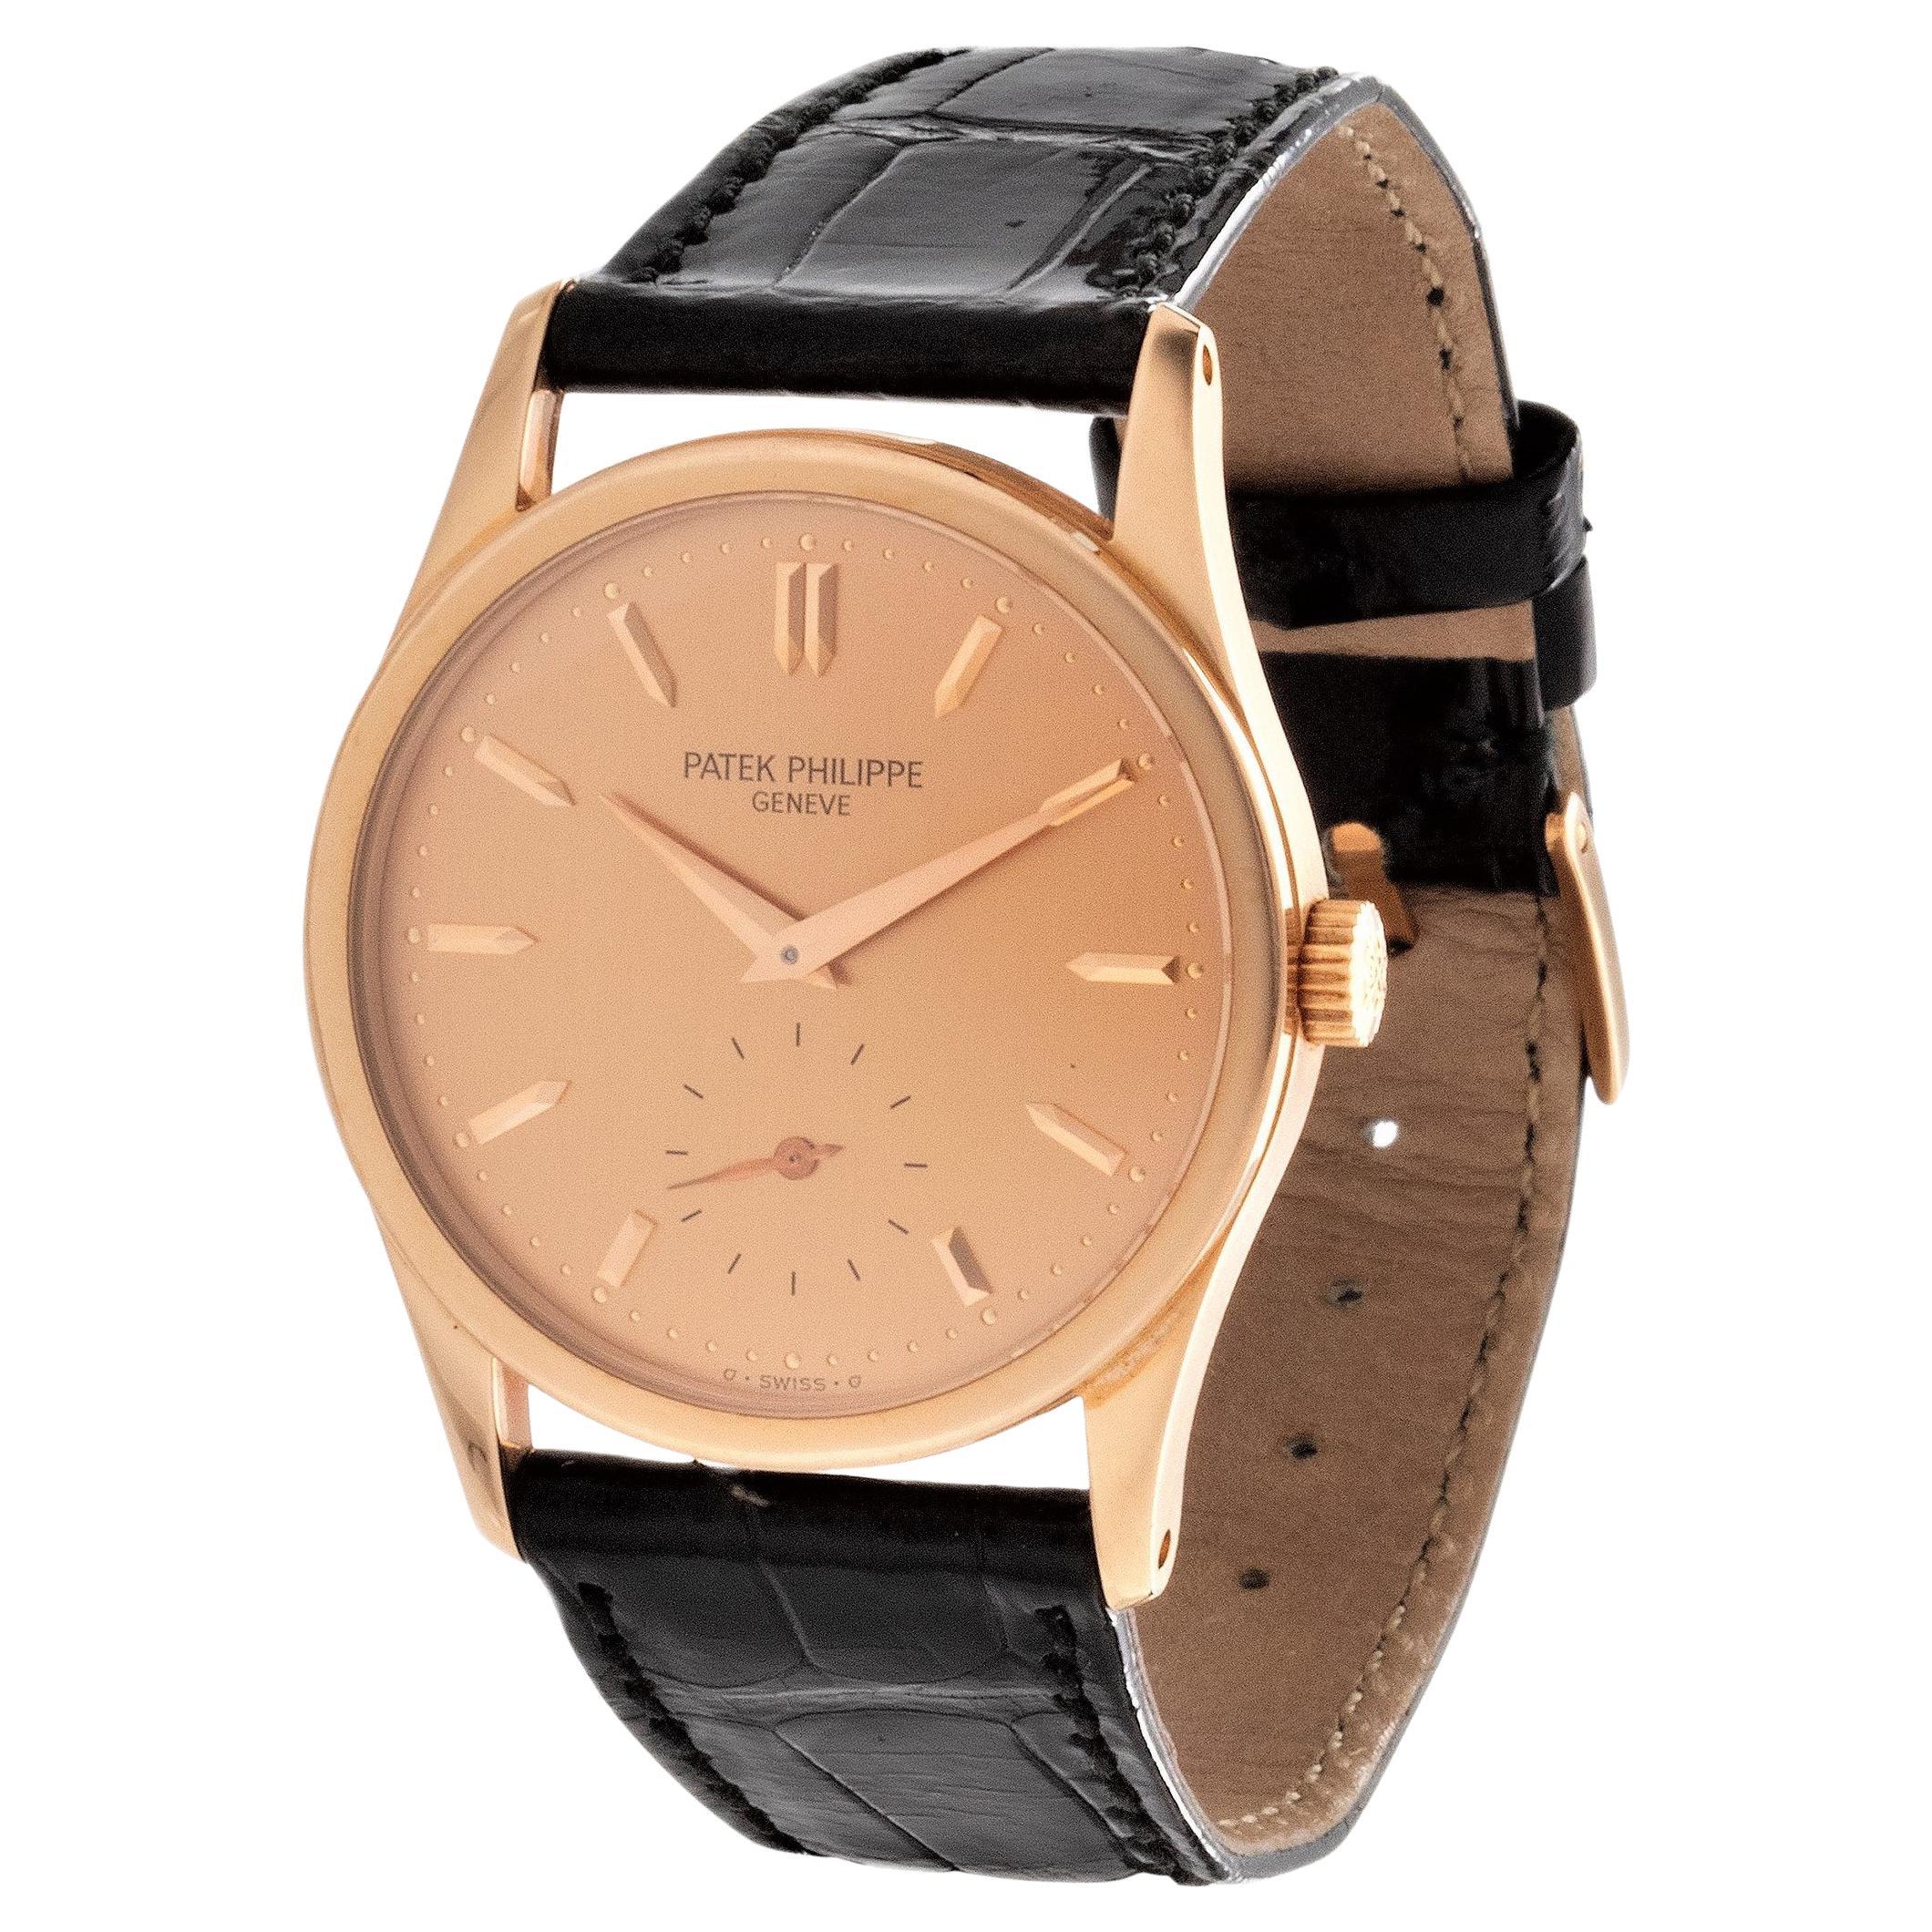 Patek Philippe 3796R Classic Calatrava Watch